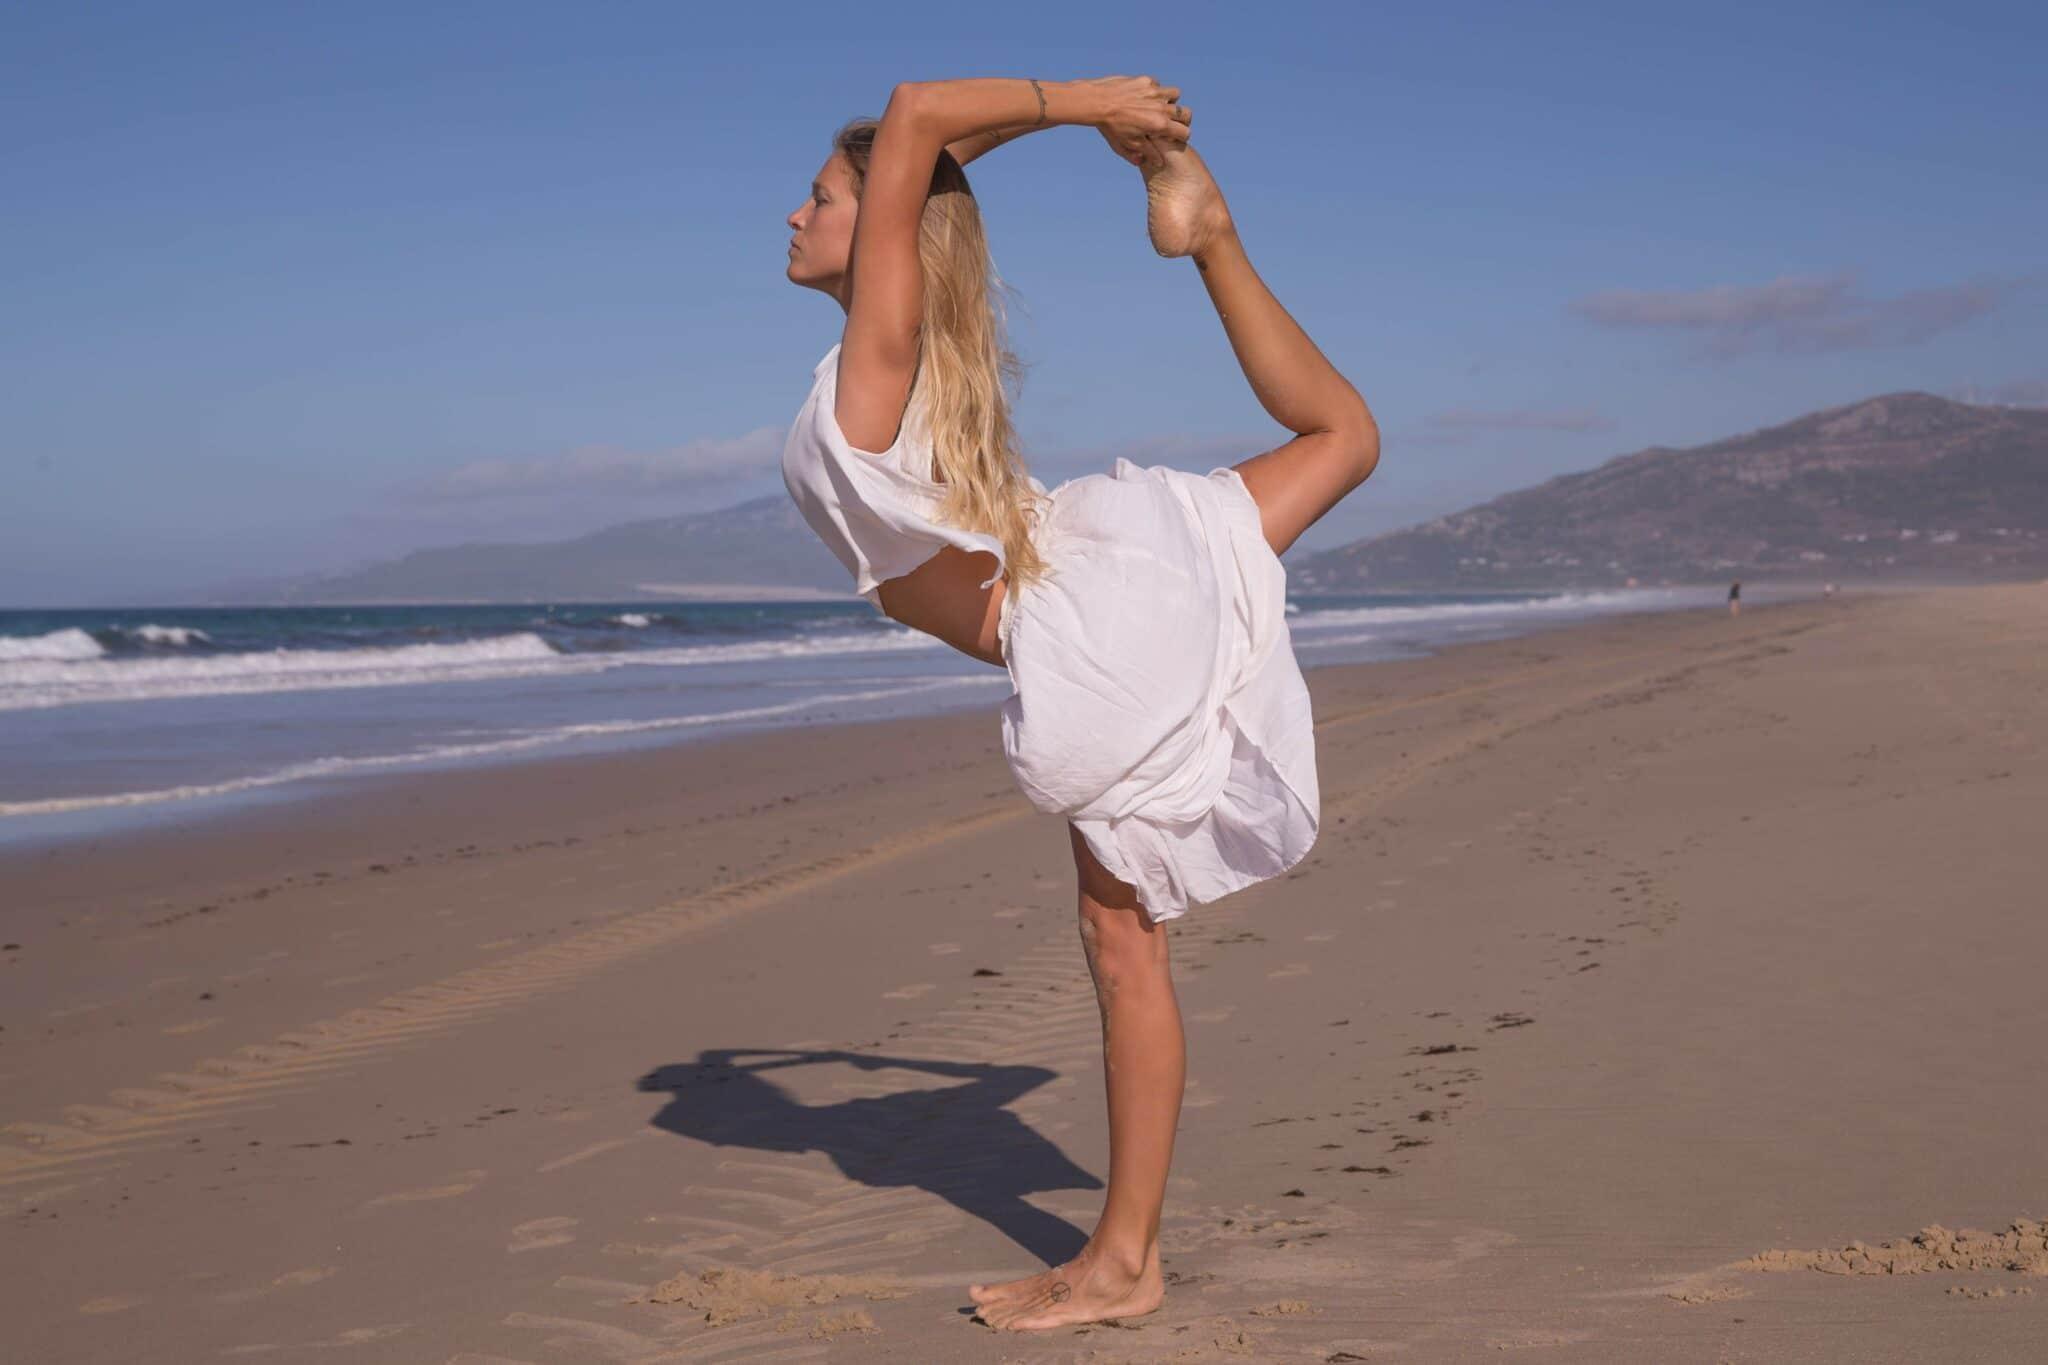 Postura del bailarín o natarajasana